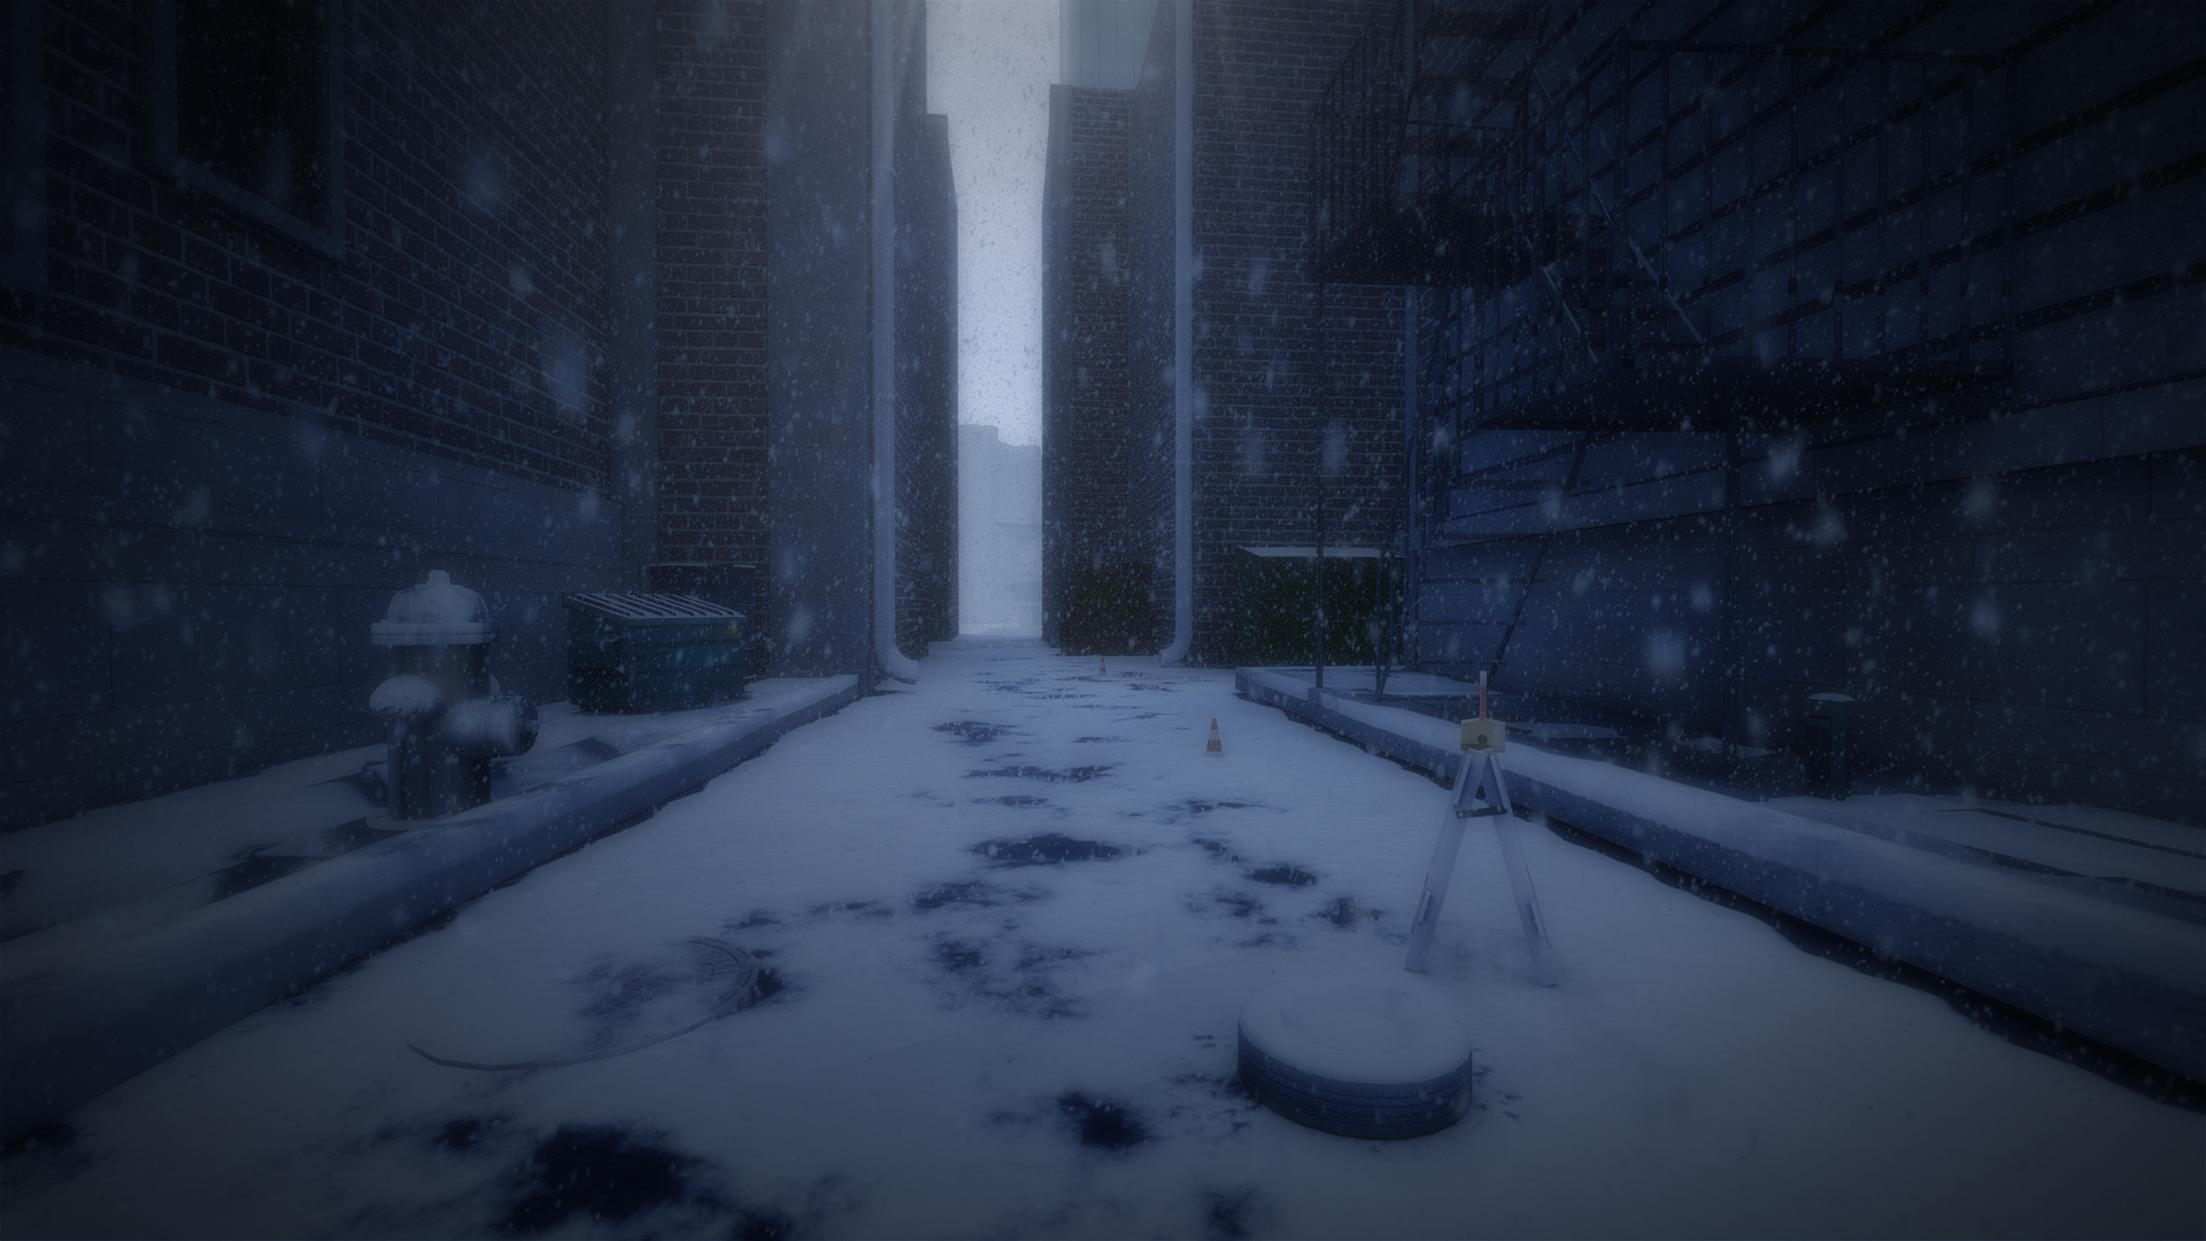 Urban visual novel backgrounds